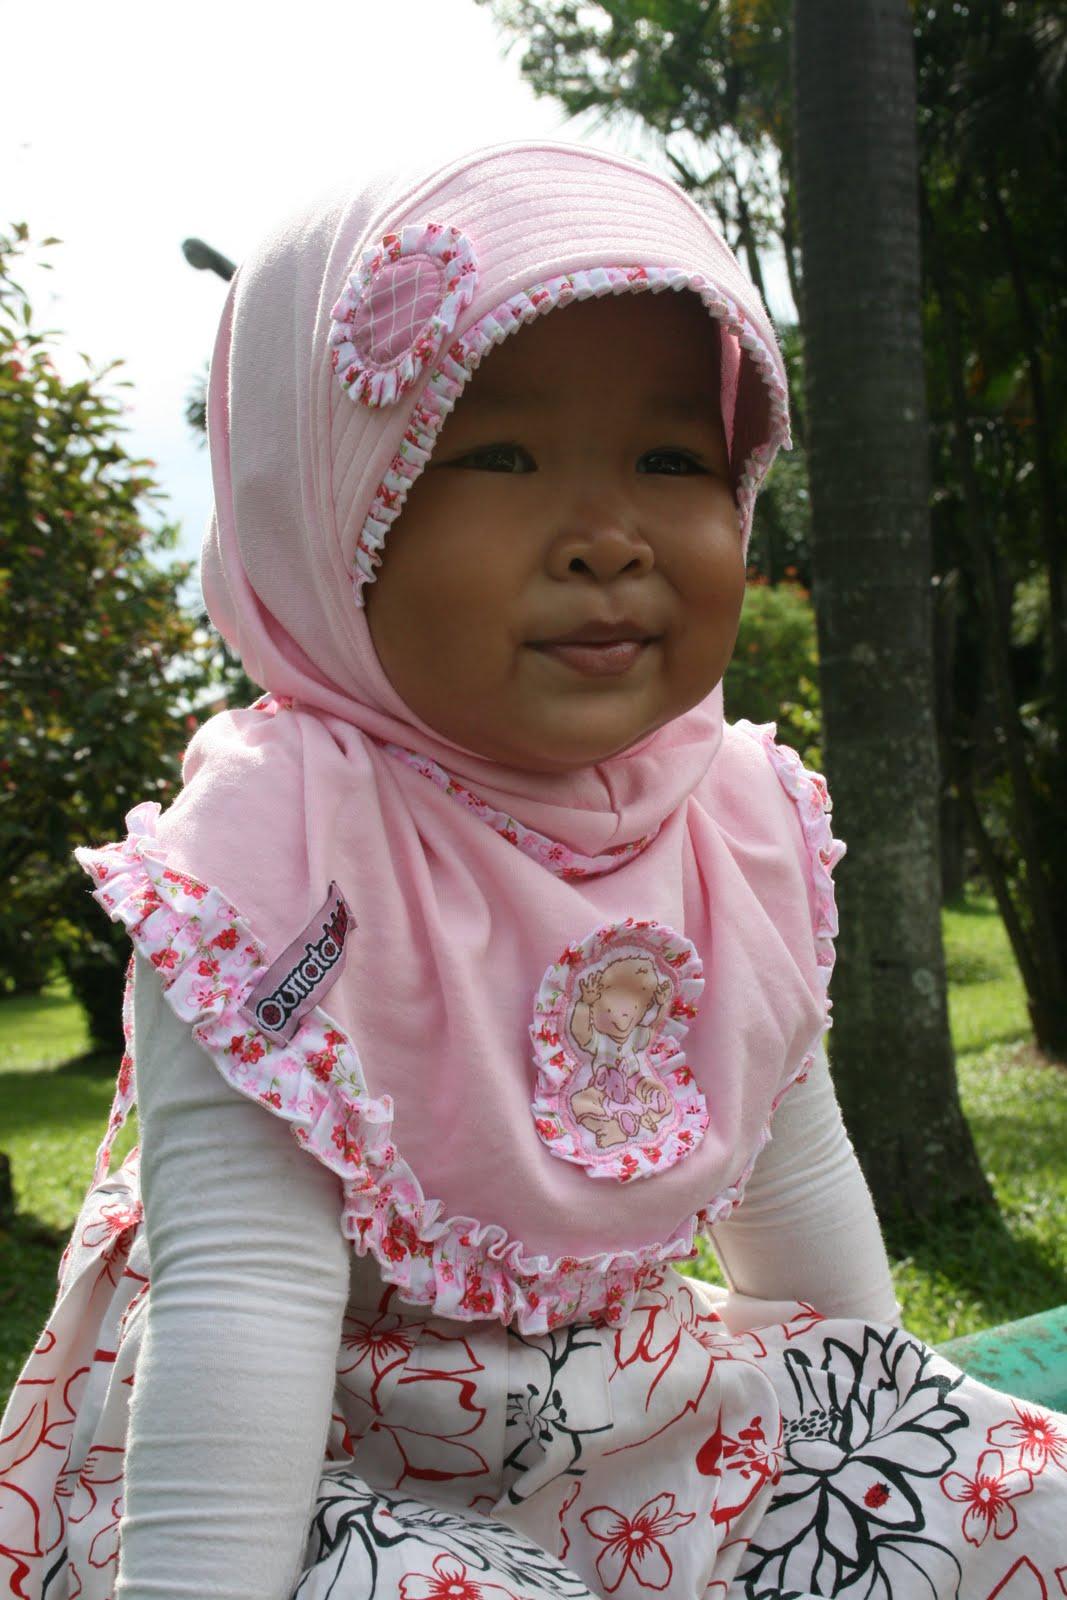 Coretan Qurrata Kidz